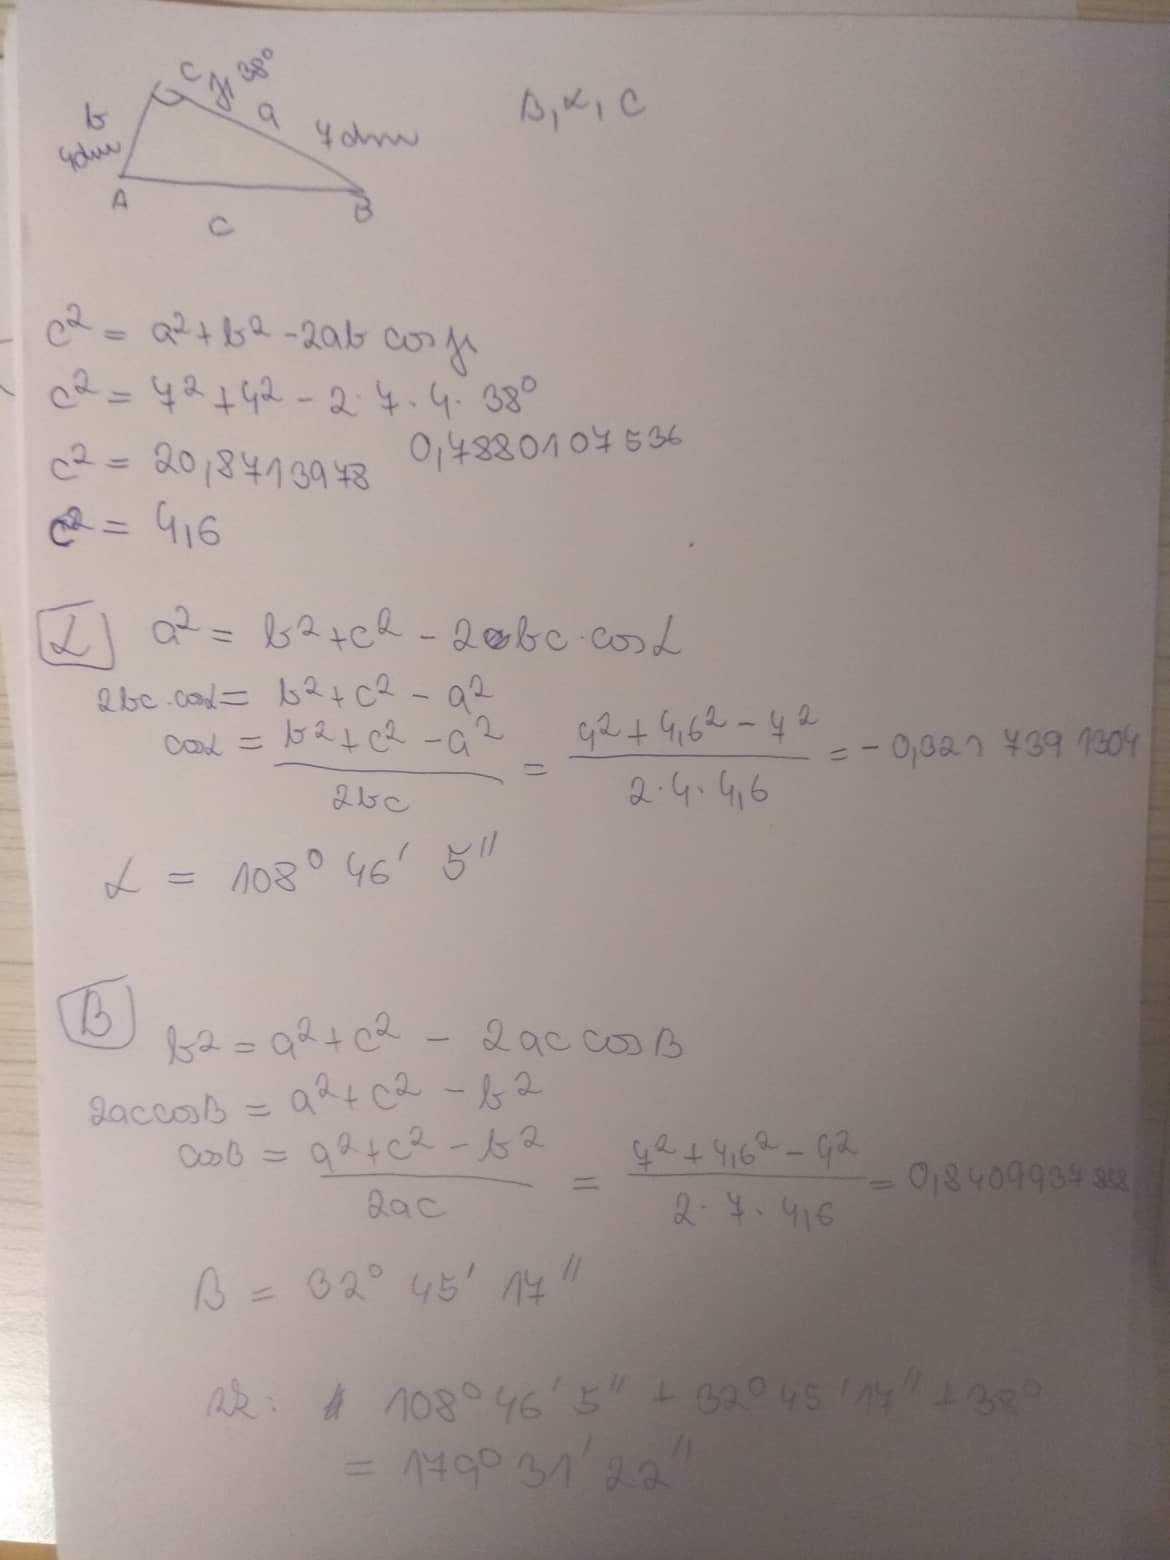 http://forum.matematika.cz/upload3/img/2019-02/09250_received_2332121037075116.jpeg